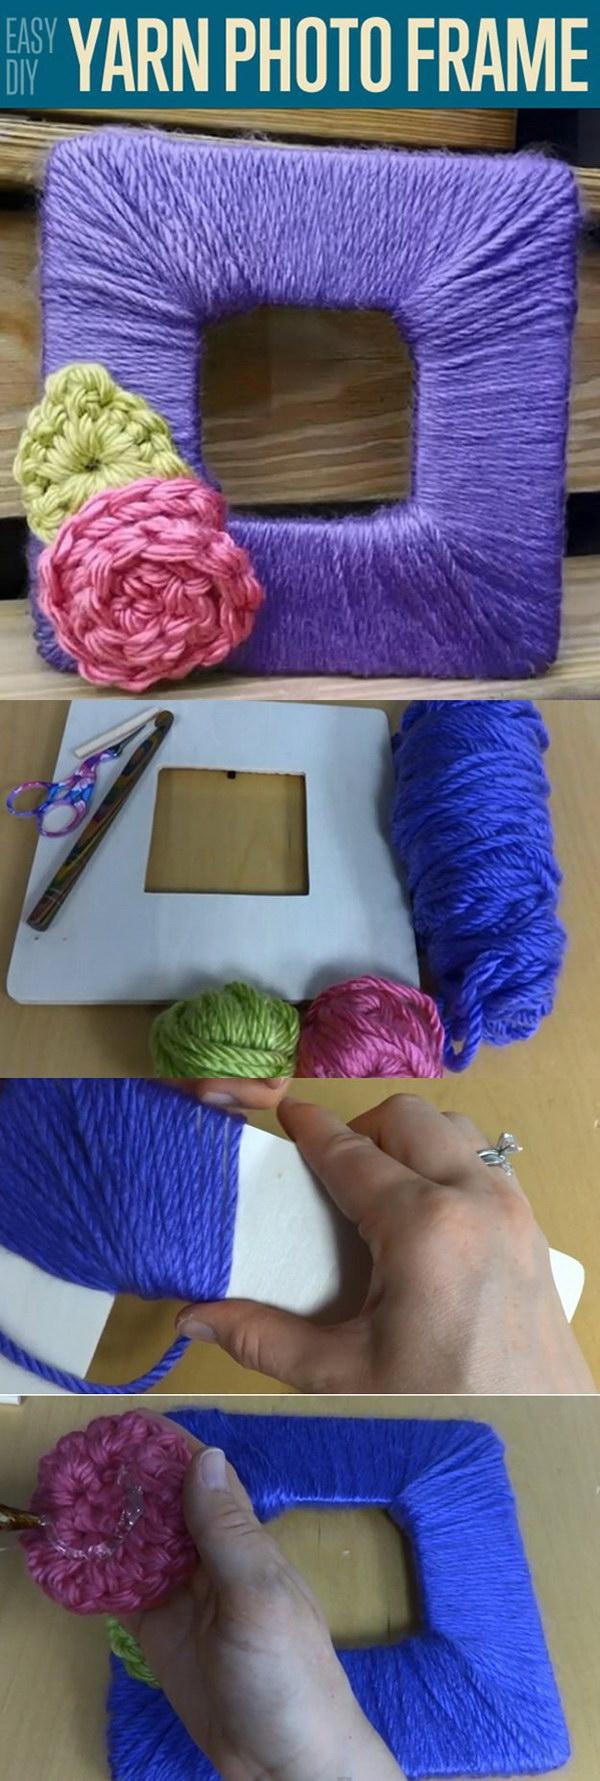 18 Yarn DIY Photo Frame